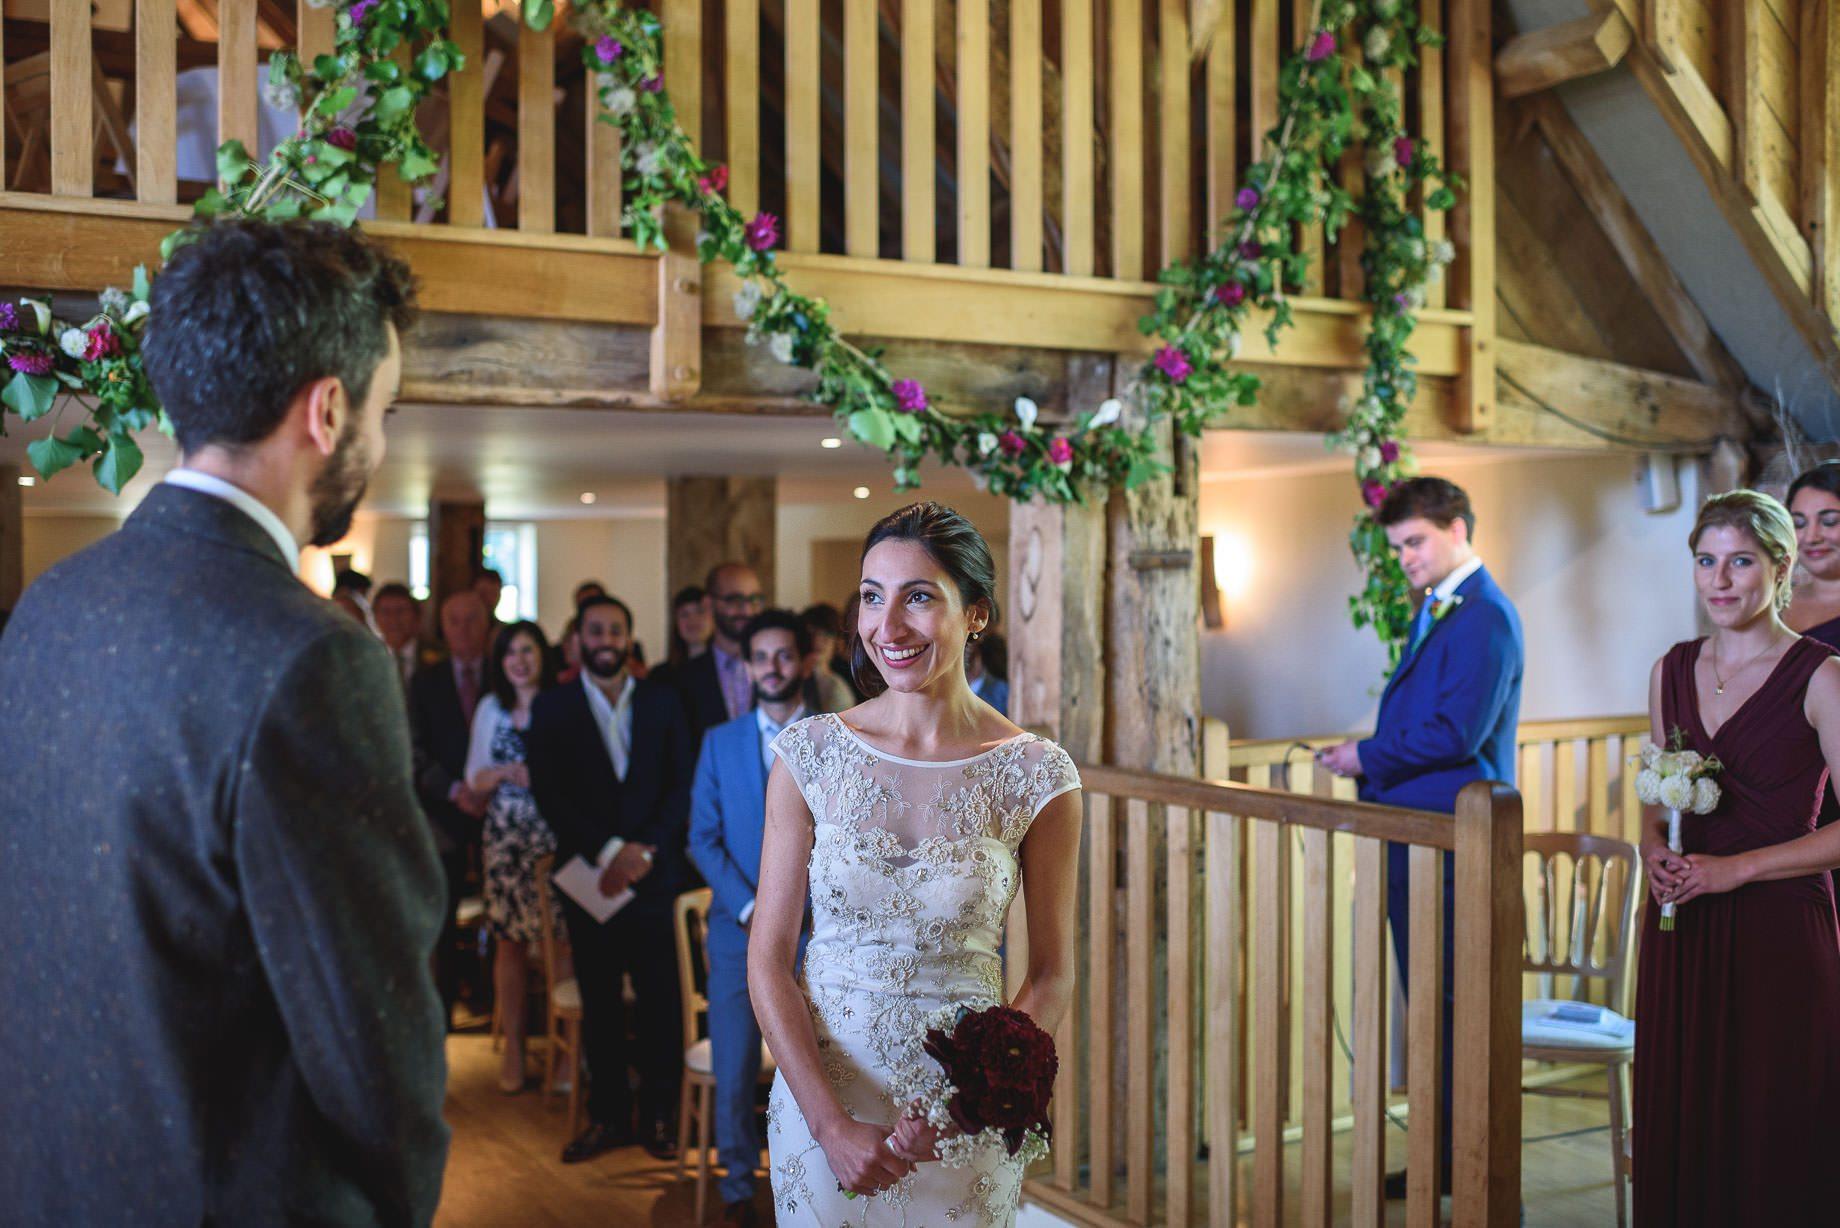 bury-court-barn-wedding-photography-guy-collier-photography-nadia-tom-52-of-184